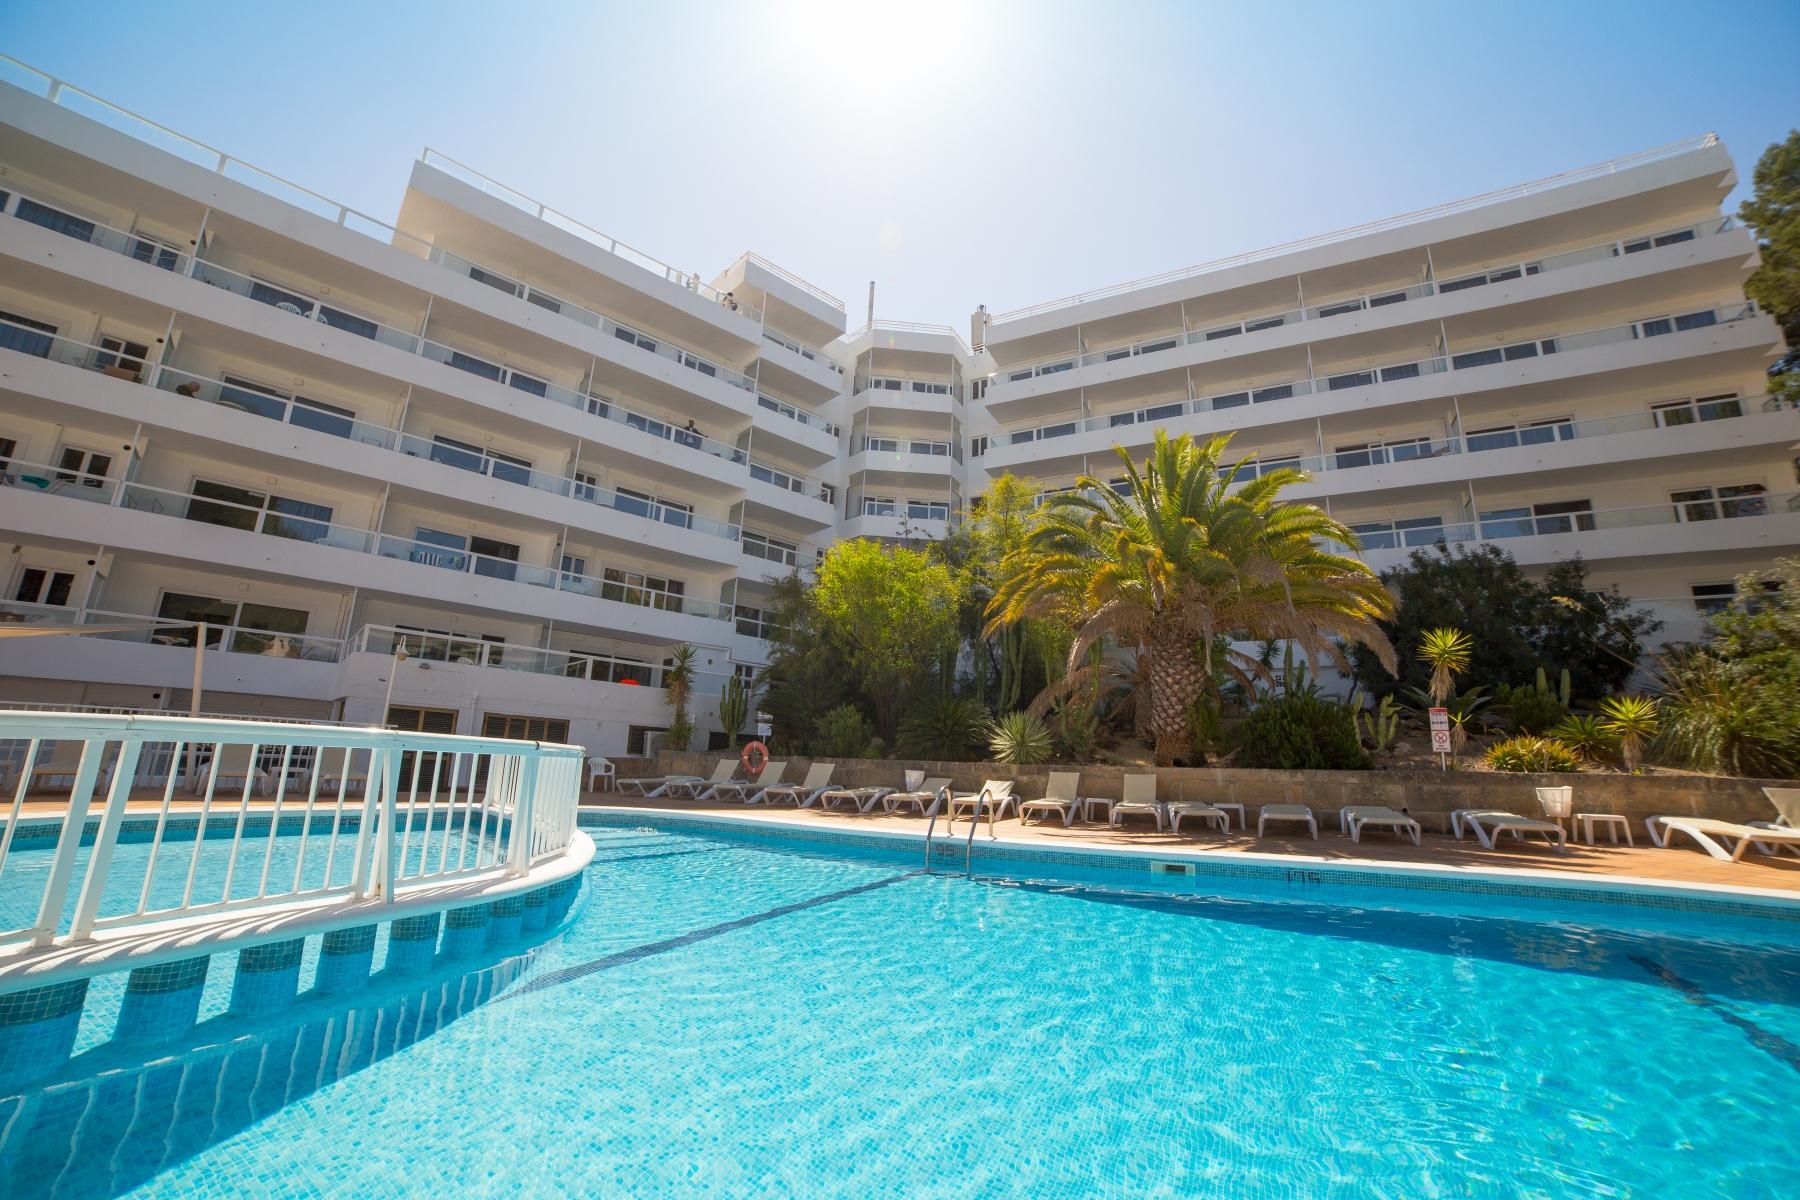 Korting bungalow Mallorca 🏕️Pierre & Vacances Résidence Mallorca Portofino